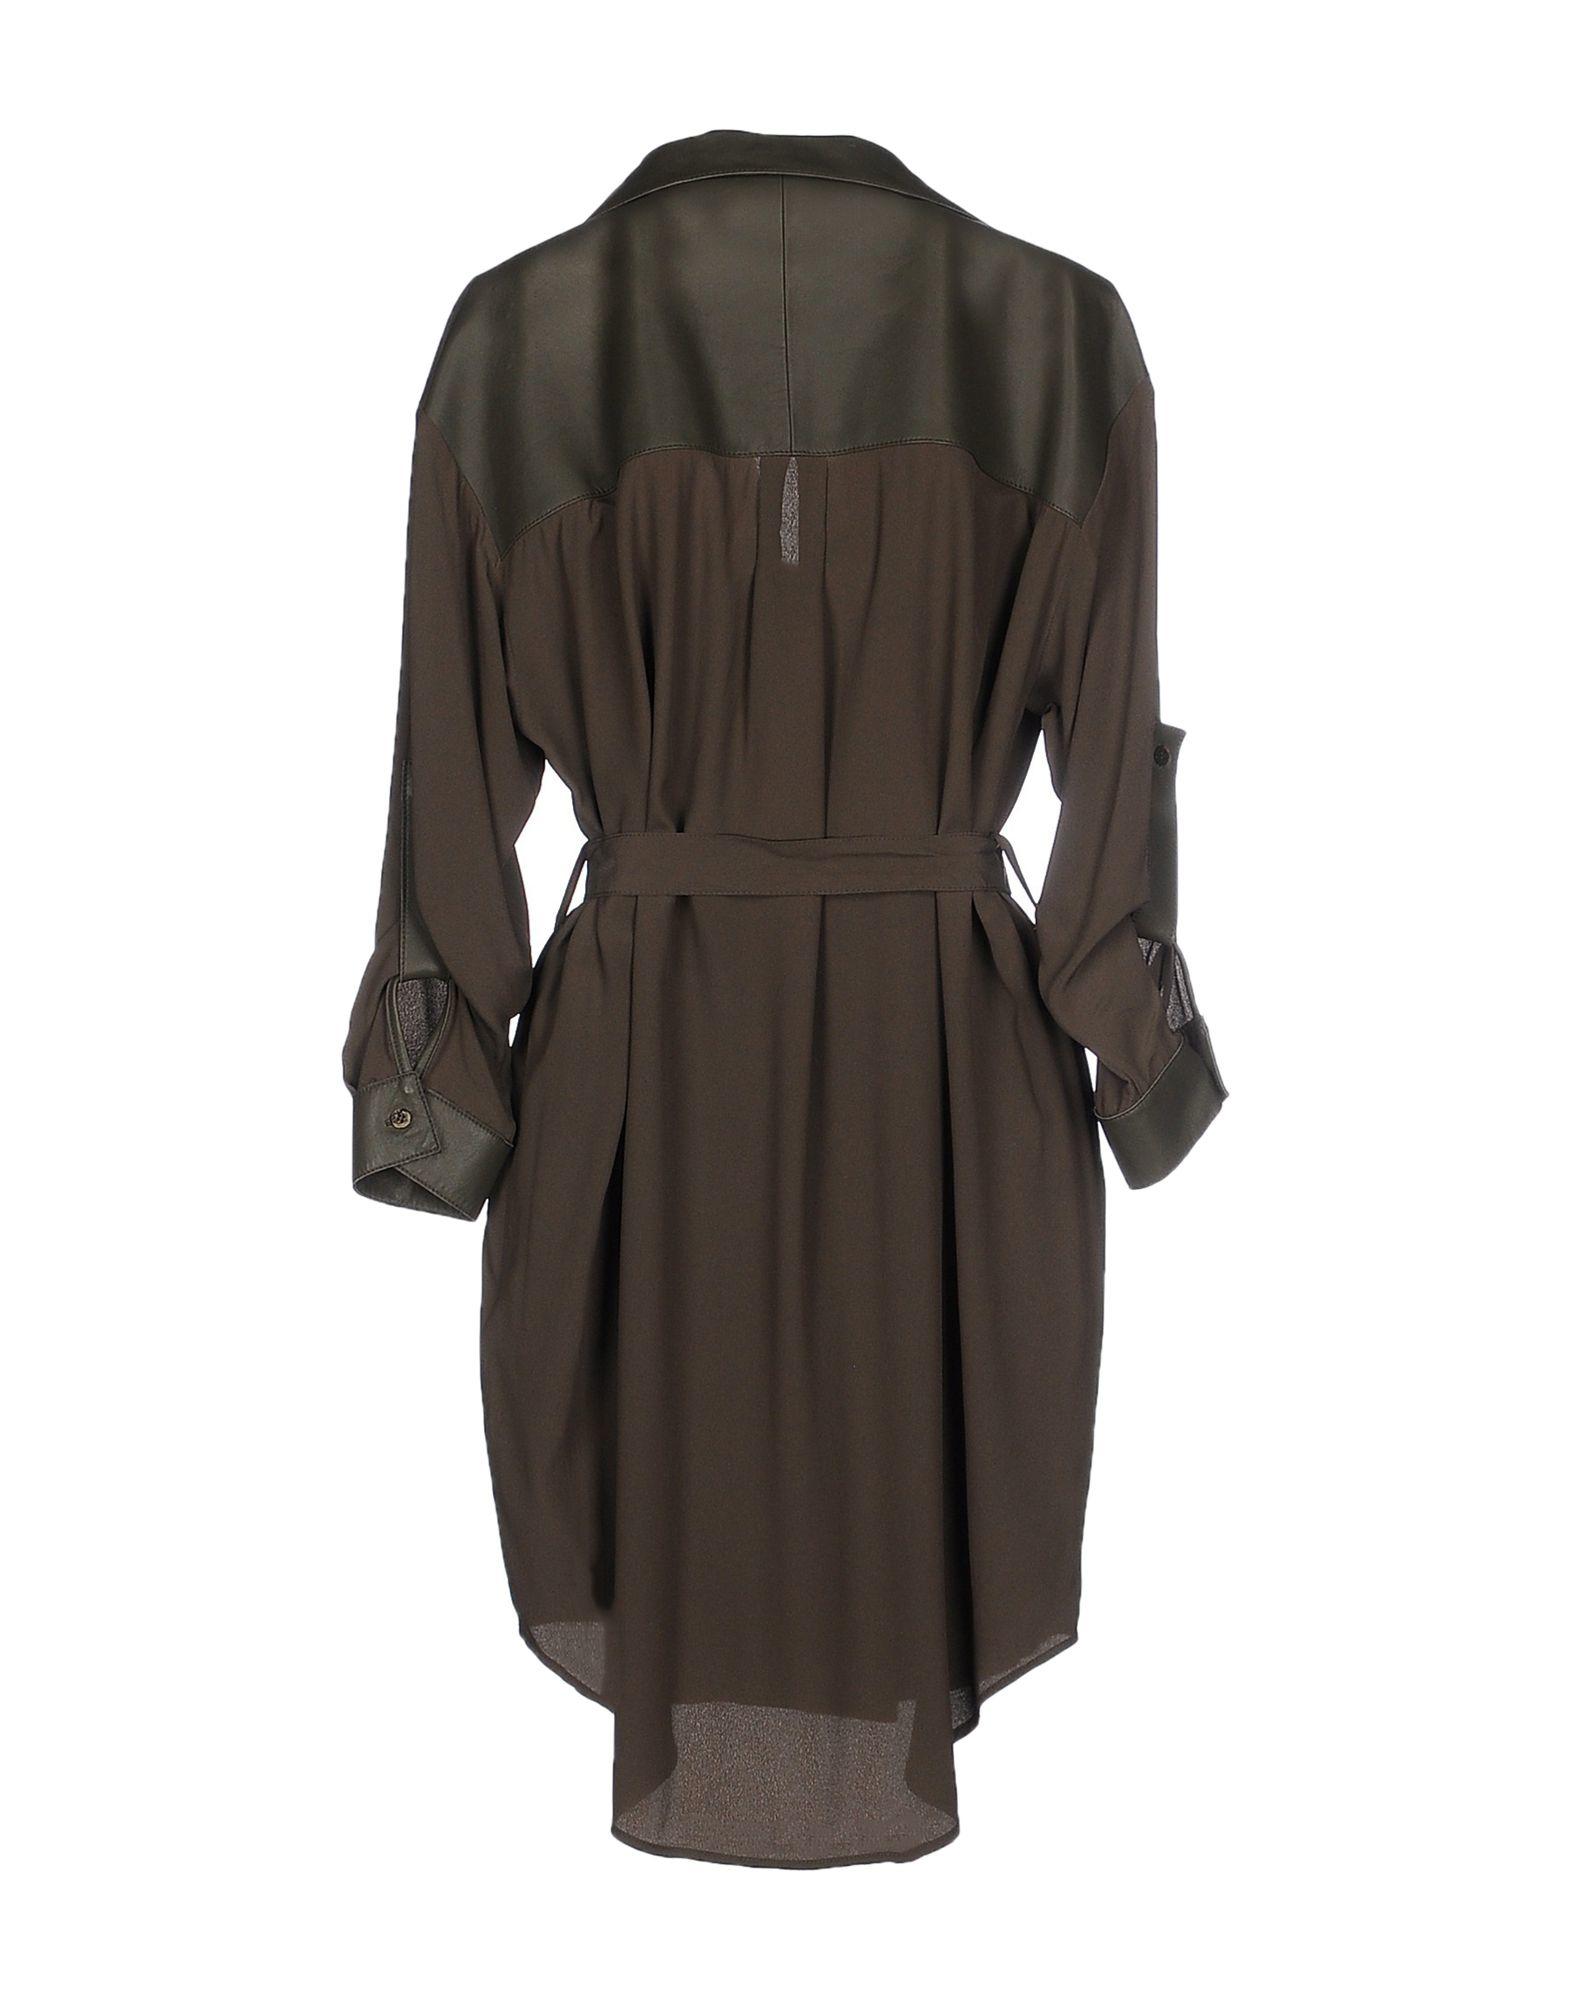 spacecraft clothing - photo #32